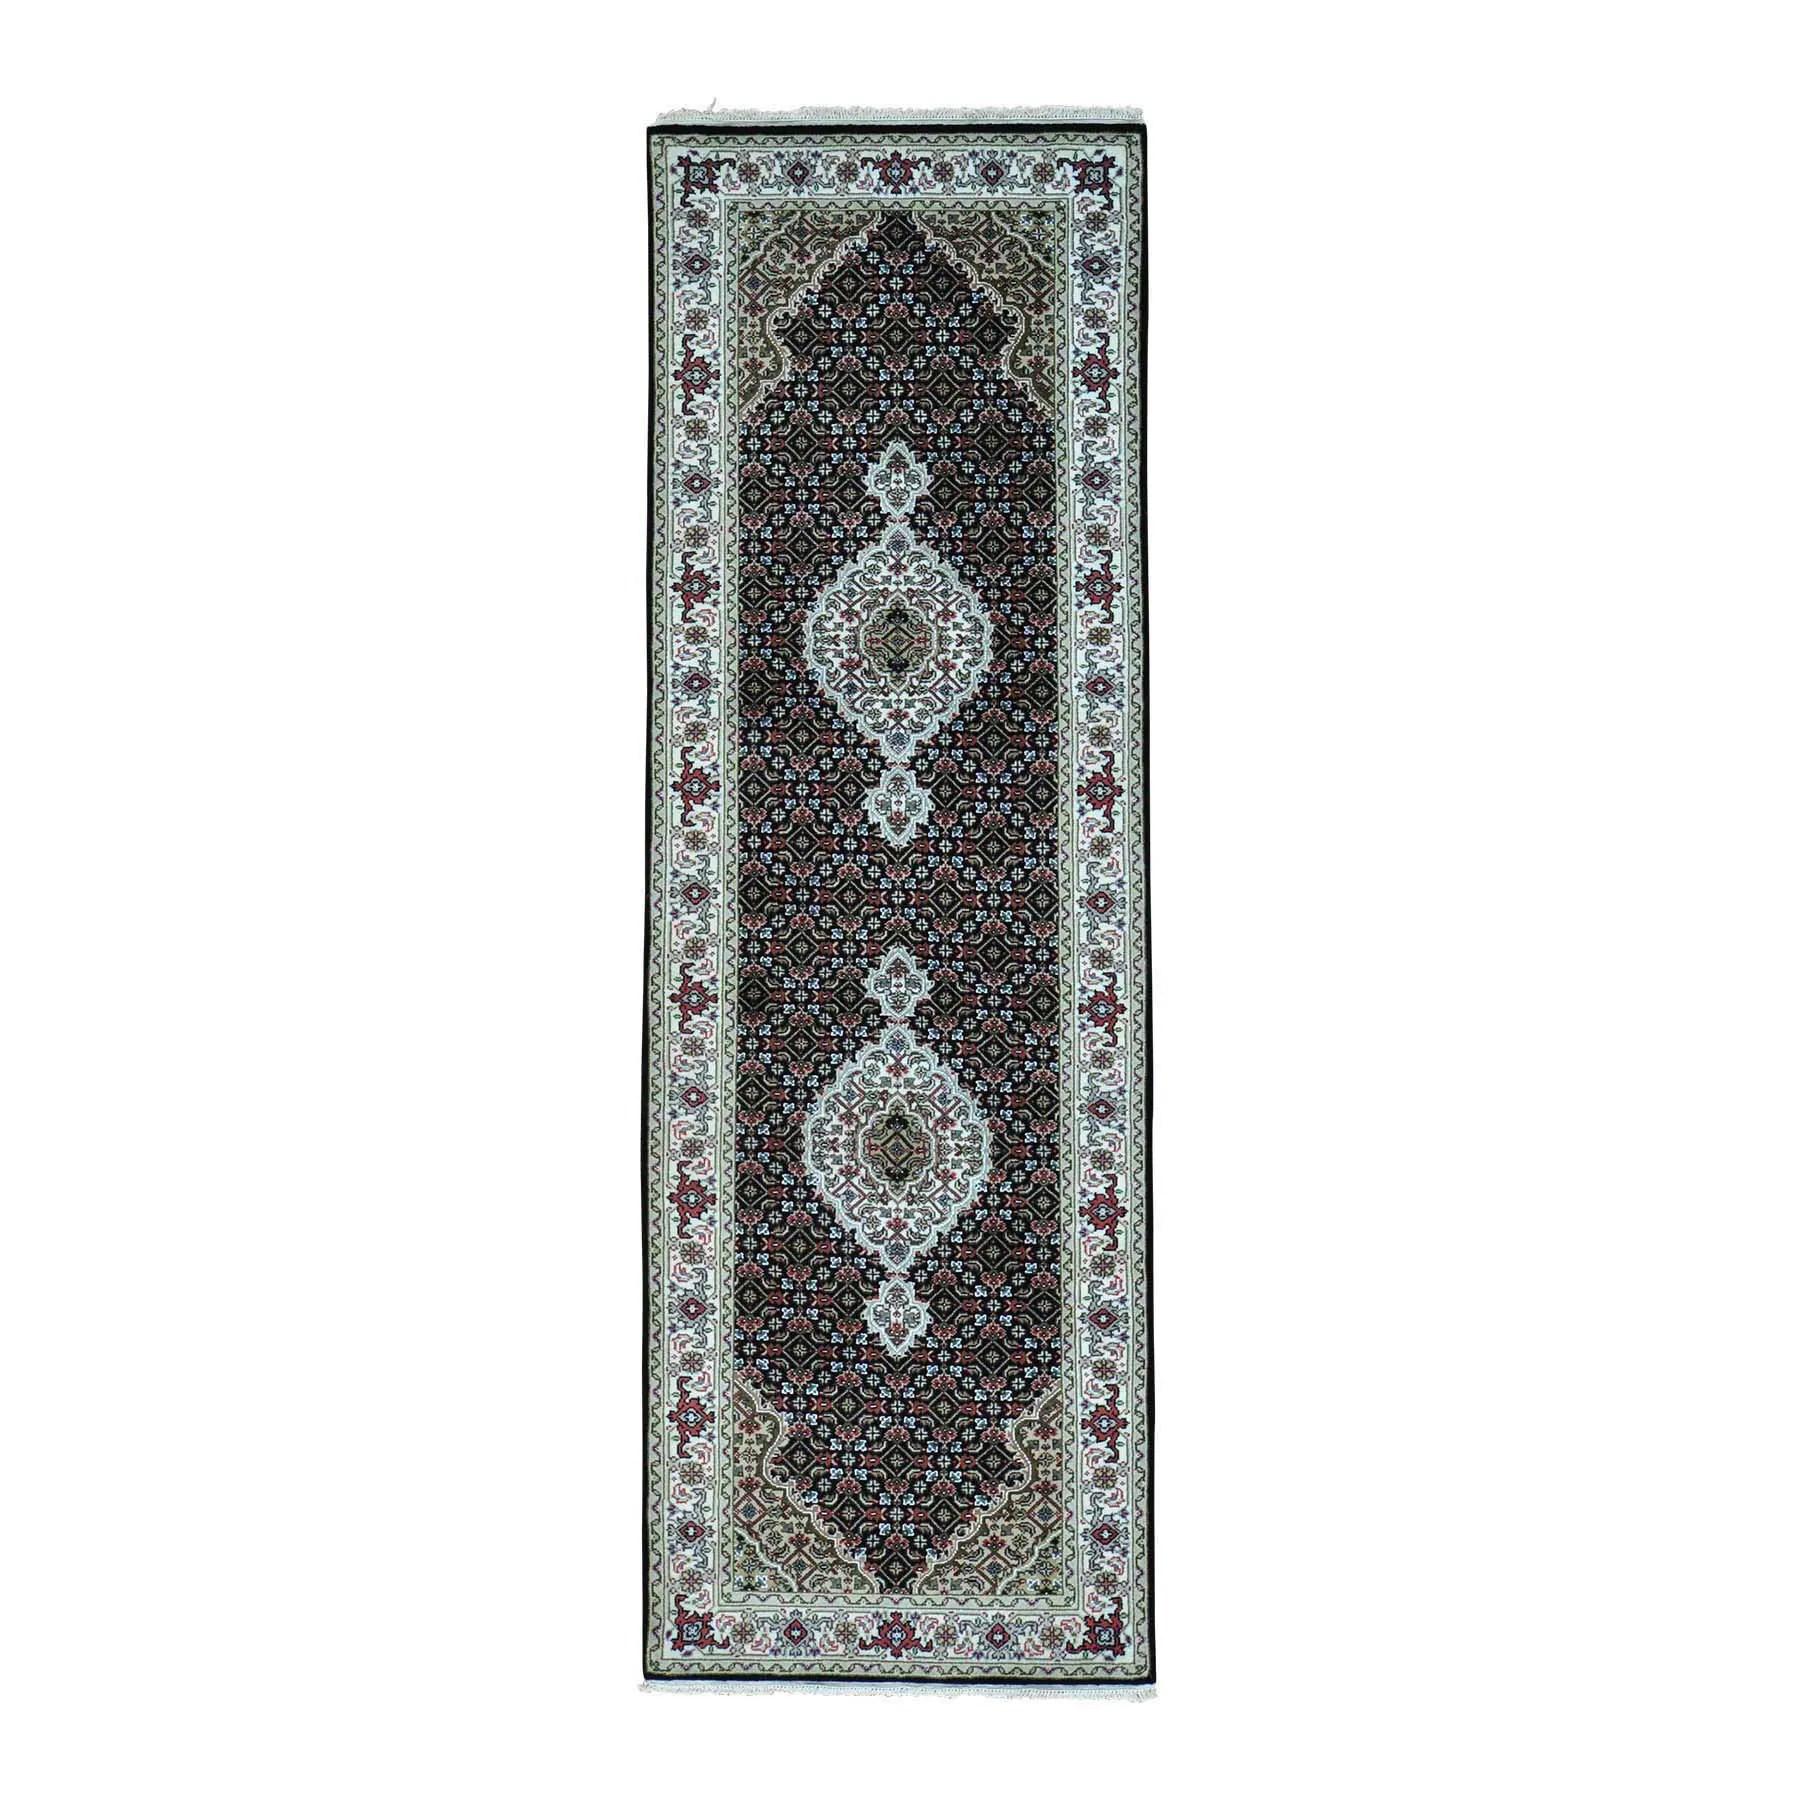 Shahbanu Rugs Hand-Knotted Wool and Silk Tabriz Mahi 250 Kpsi Runner Rug (2'7x10'0)